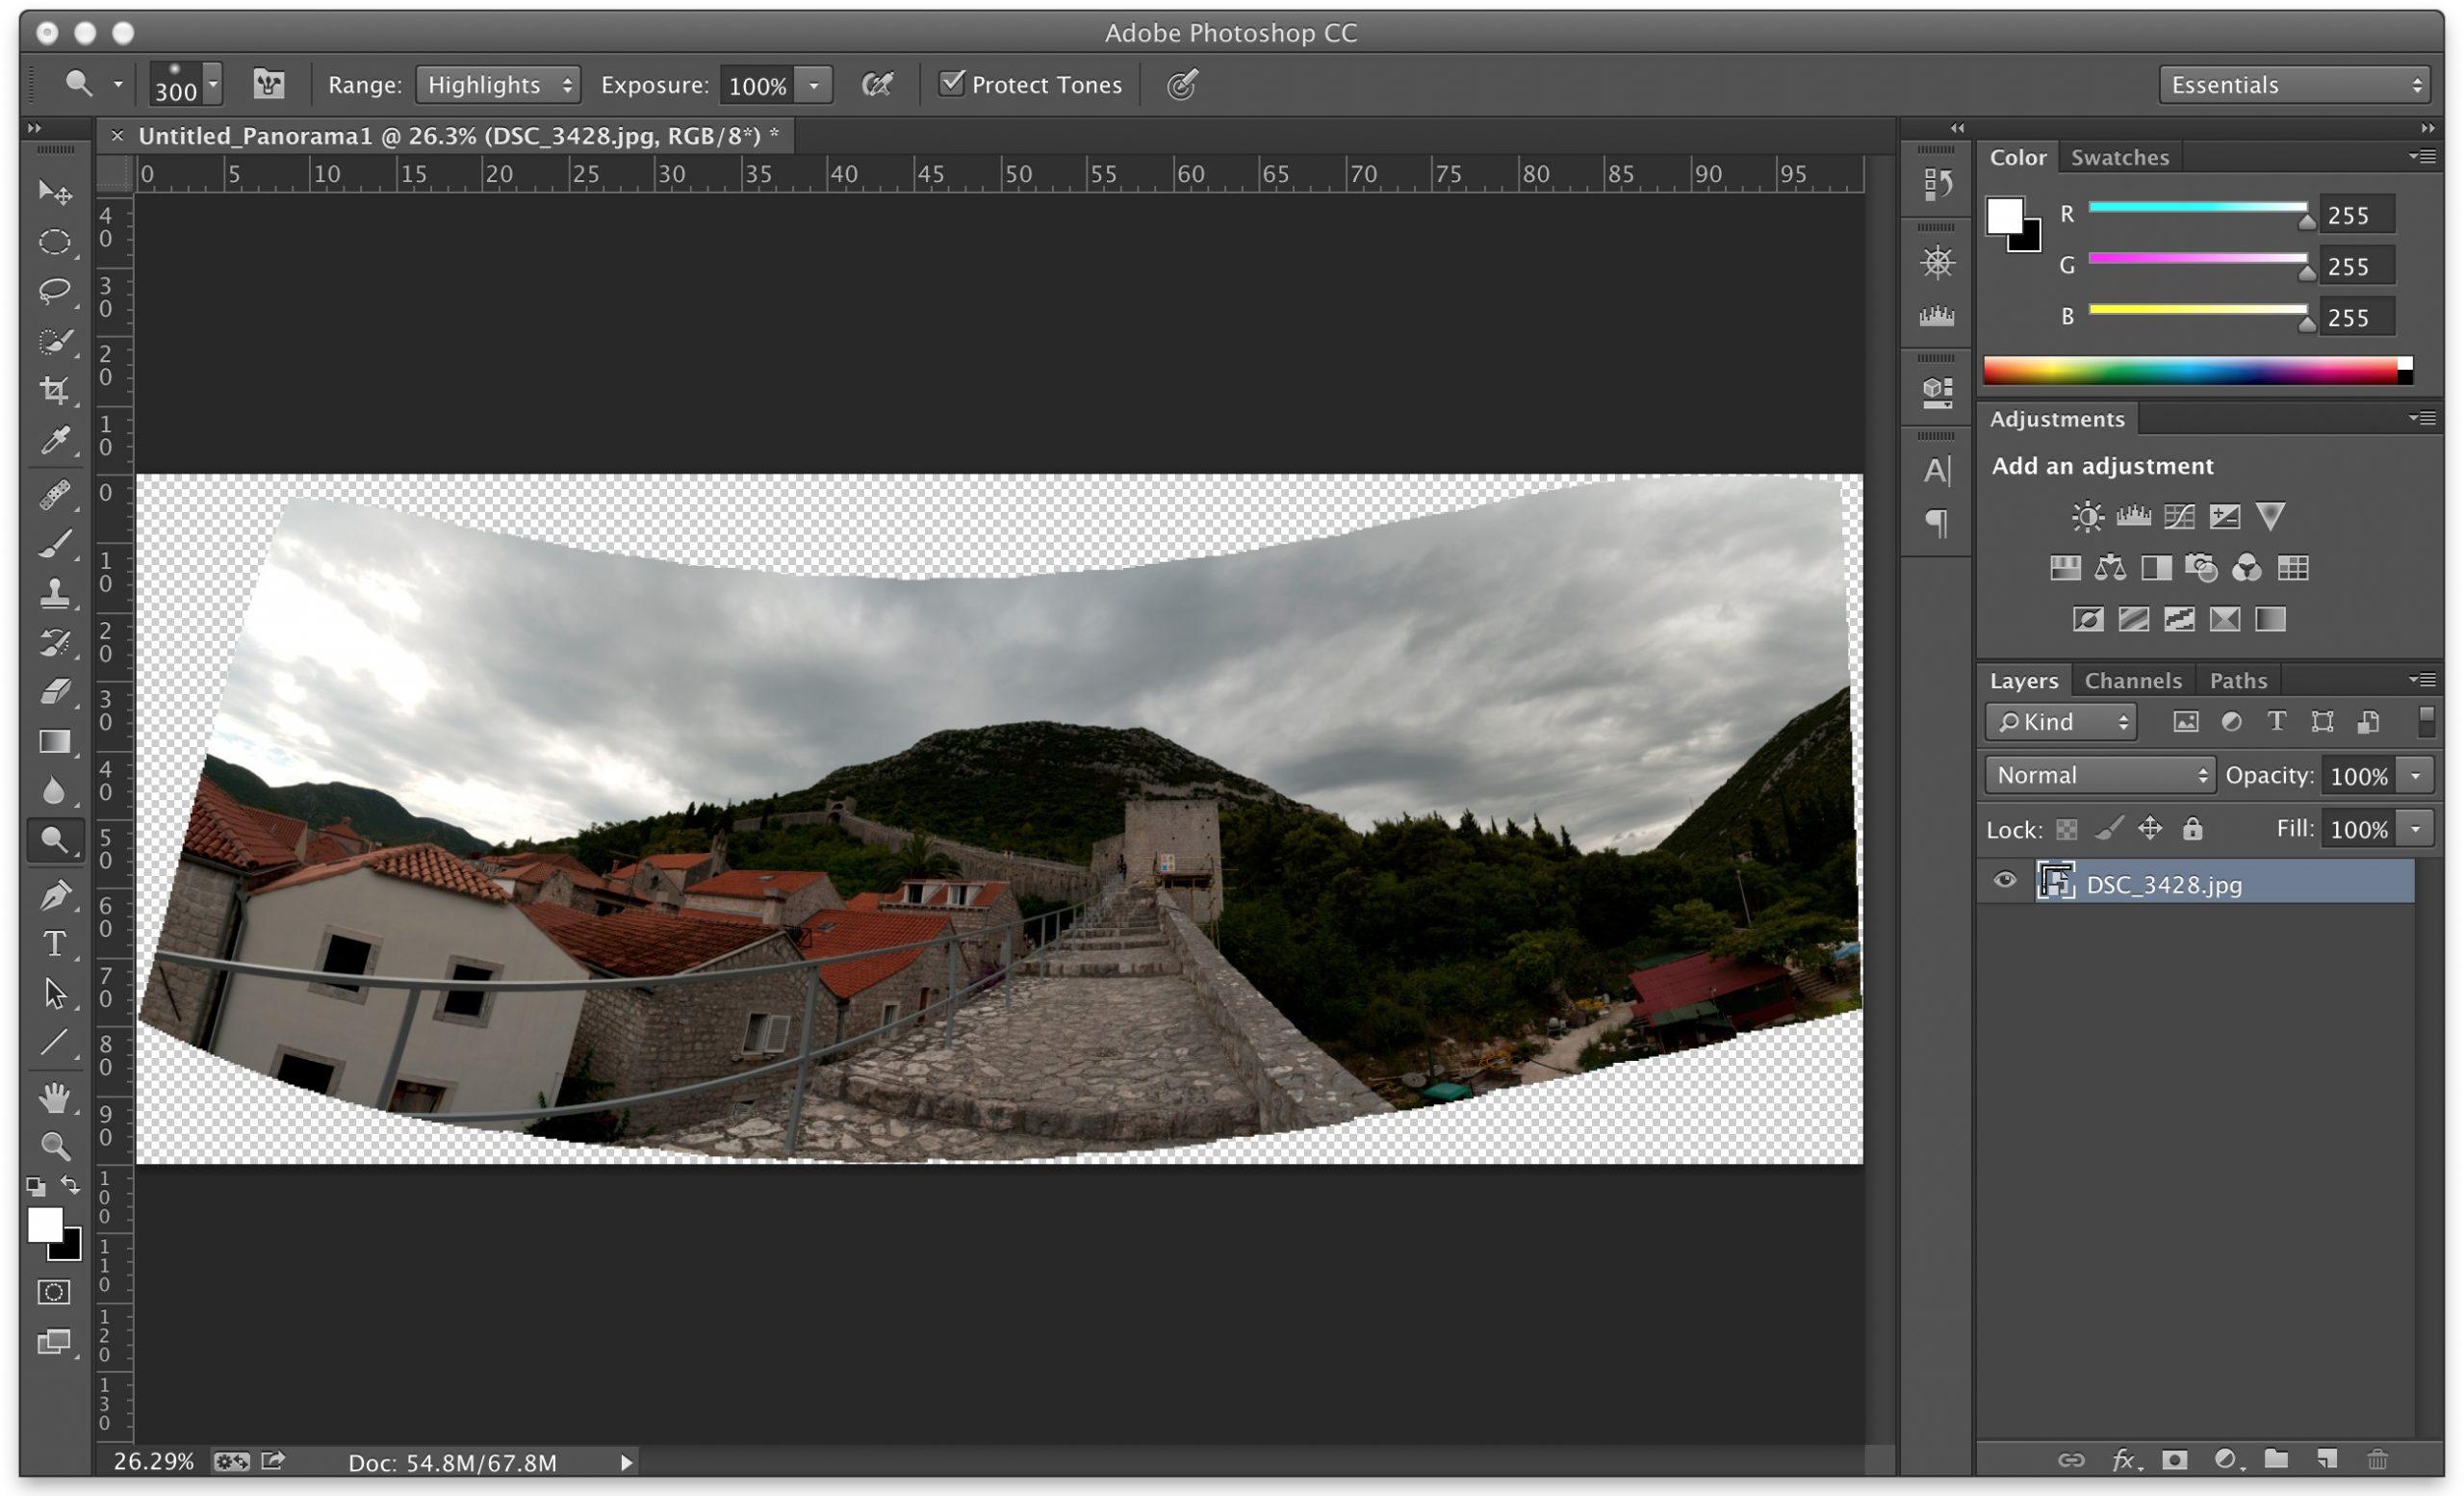 Aprender a editar fotos en photoshop cs6 76